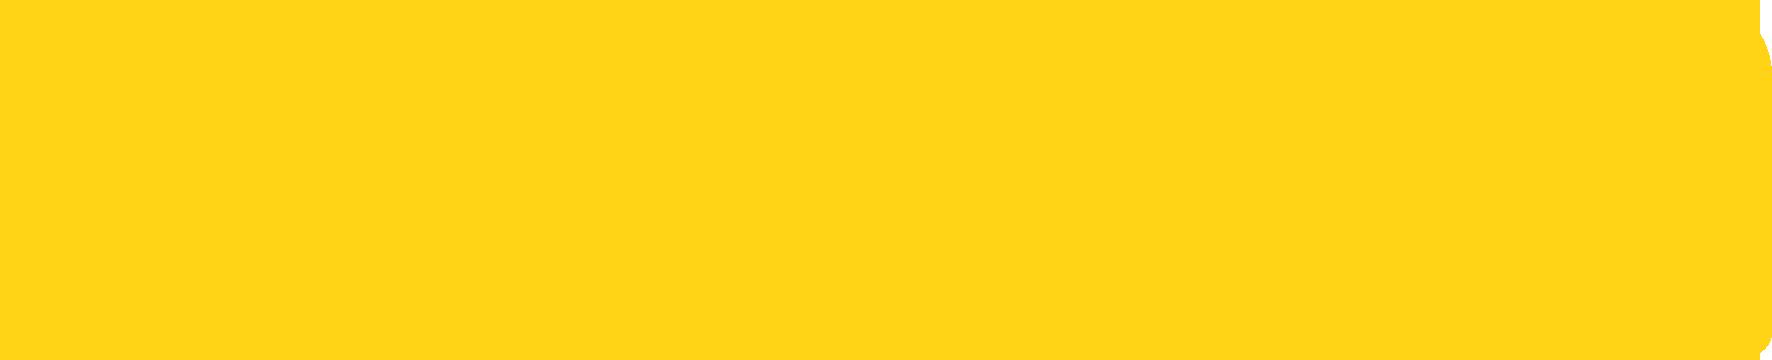 giallo musica woodstock